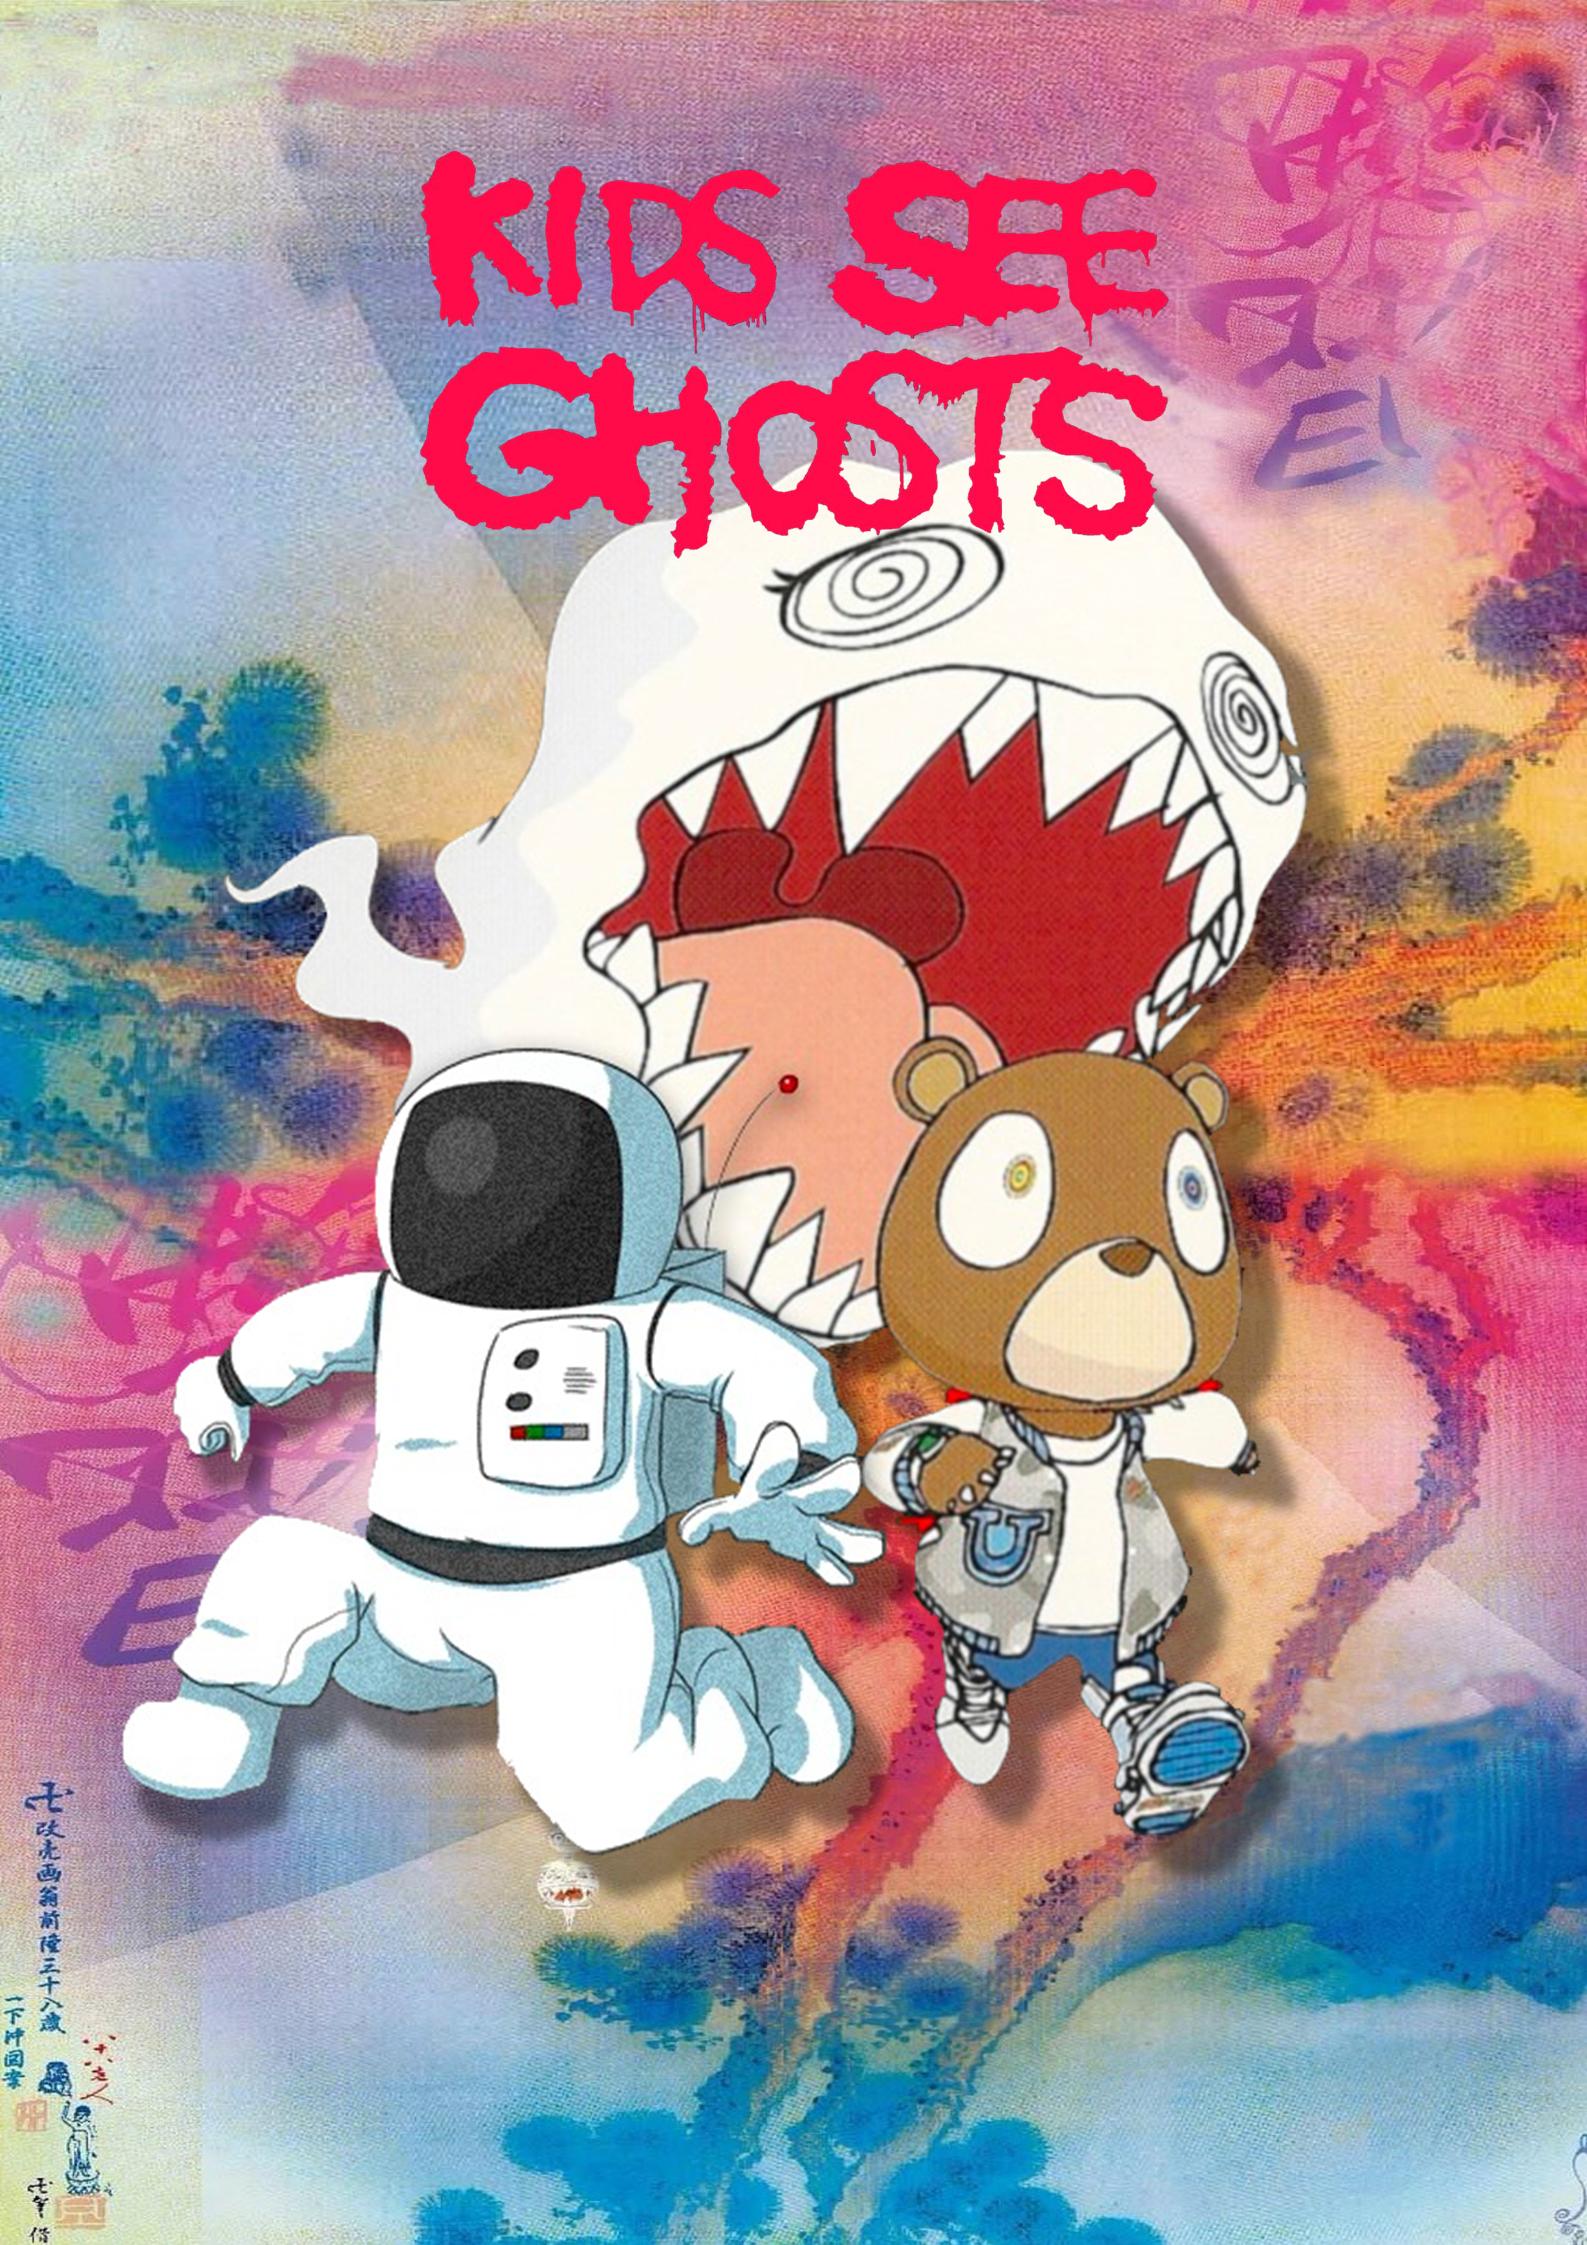 Kanye West And Kid Cudi Kids See Ghosts Poster Etsy In 2020 Kid Cudi Poster Kid Cudi Kanye West Kids